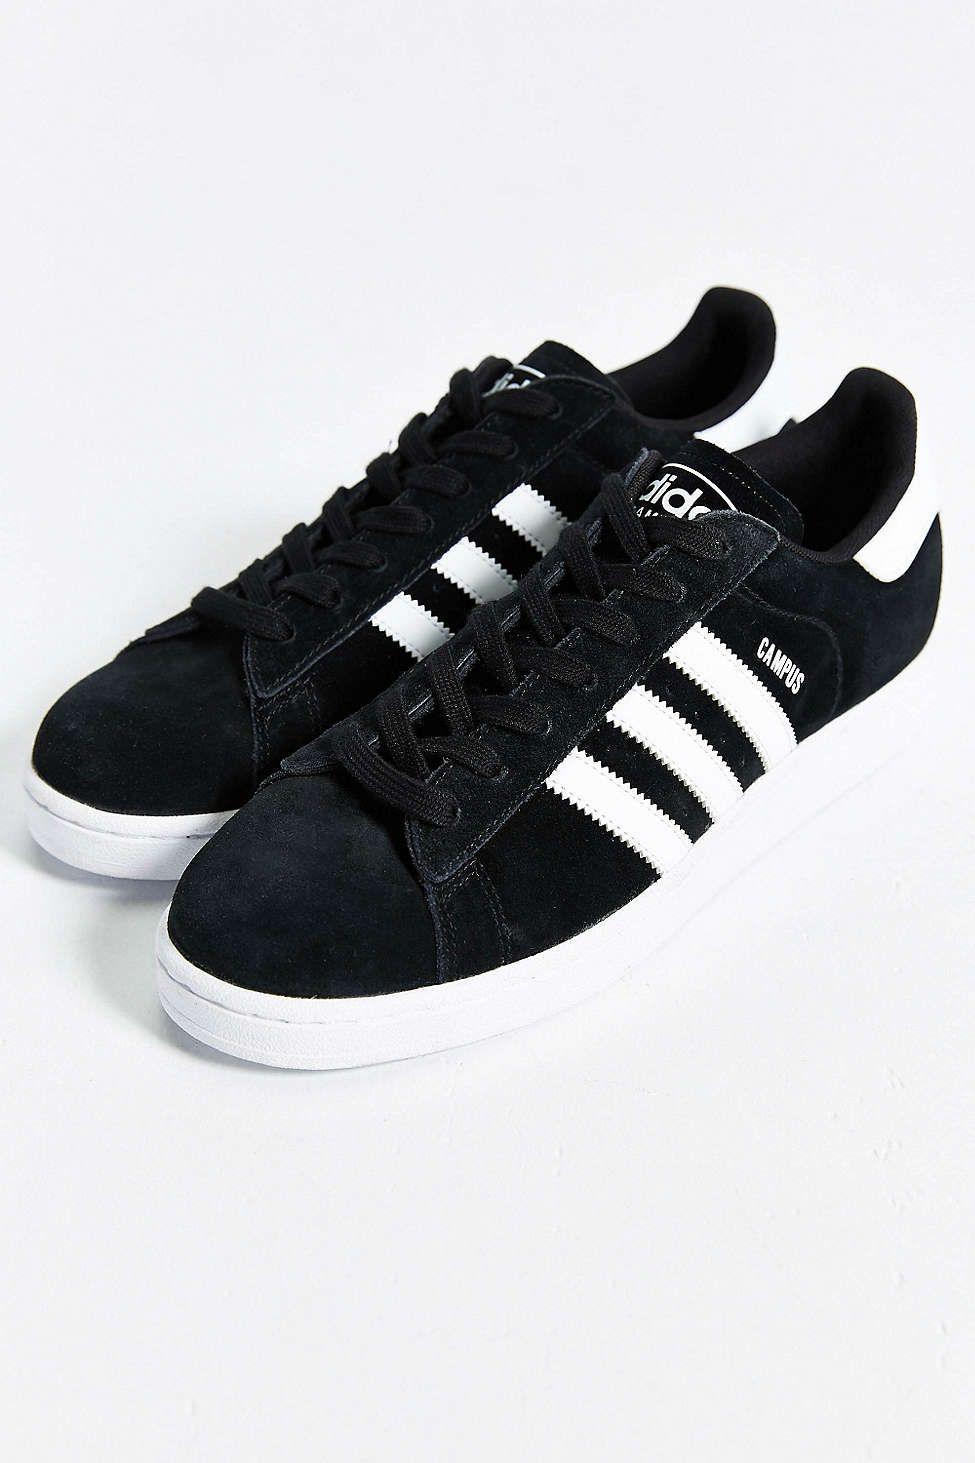 Originals Adidas Sneaker 2 Chaussure Campus vwPqdwU